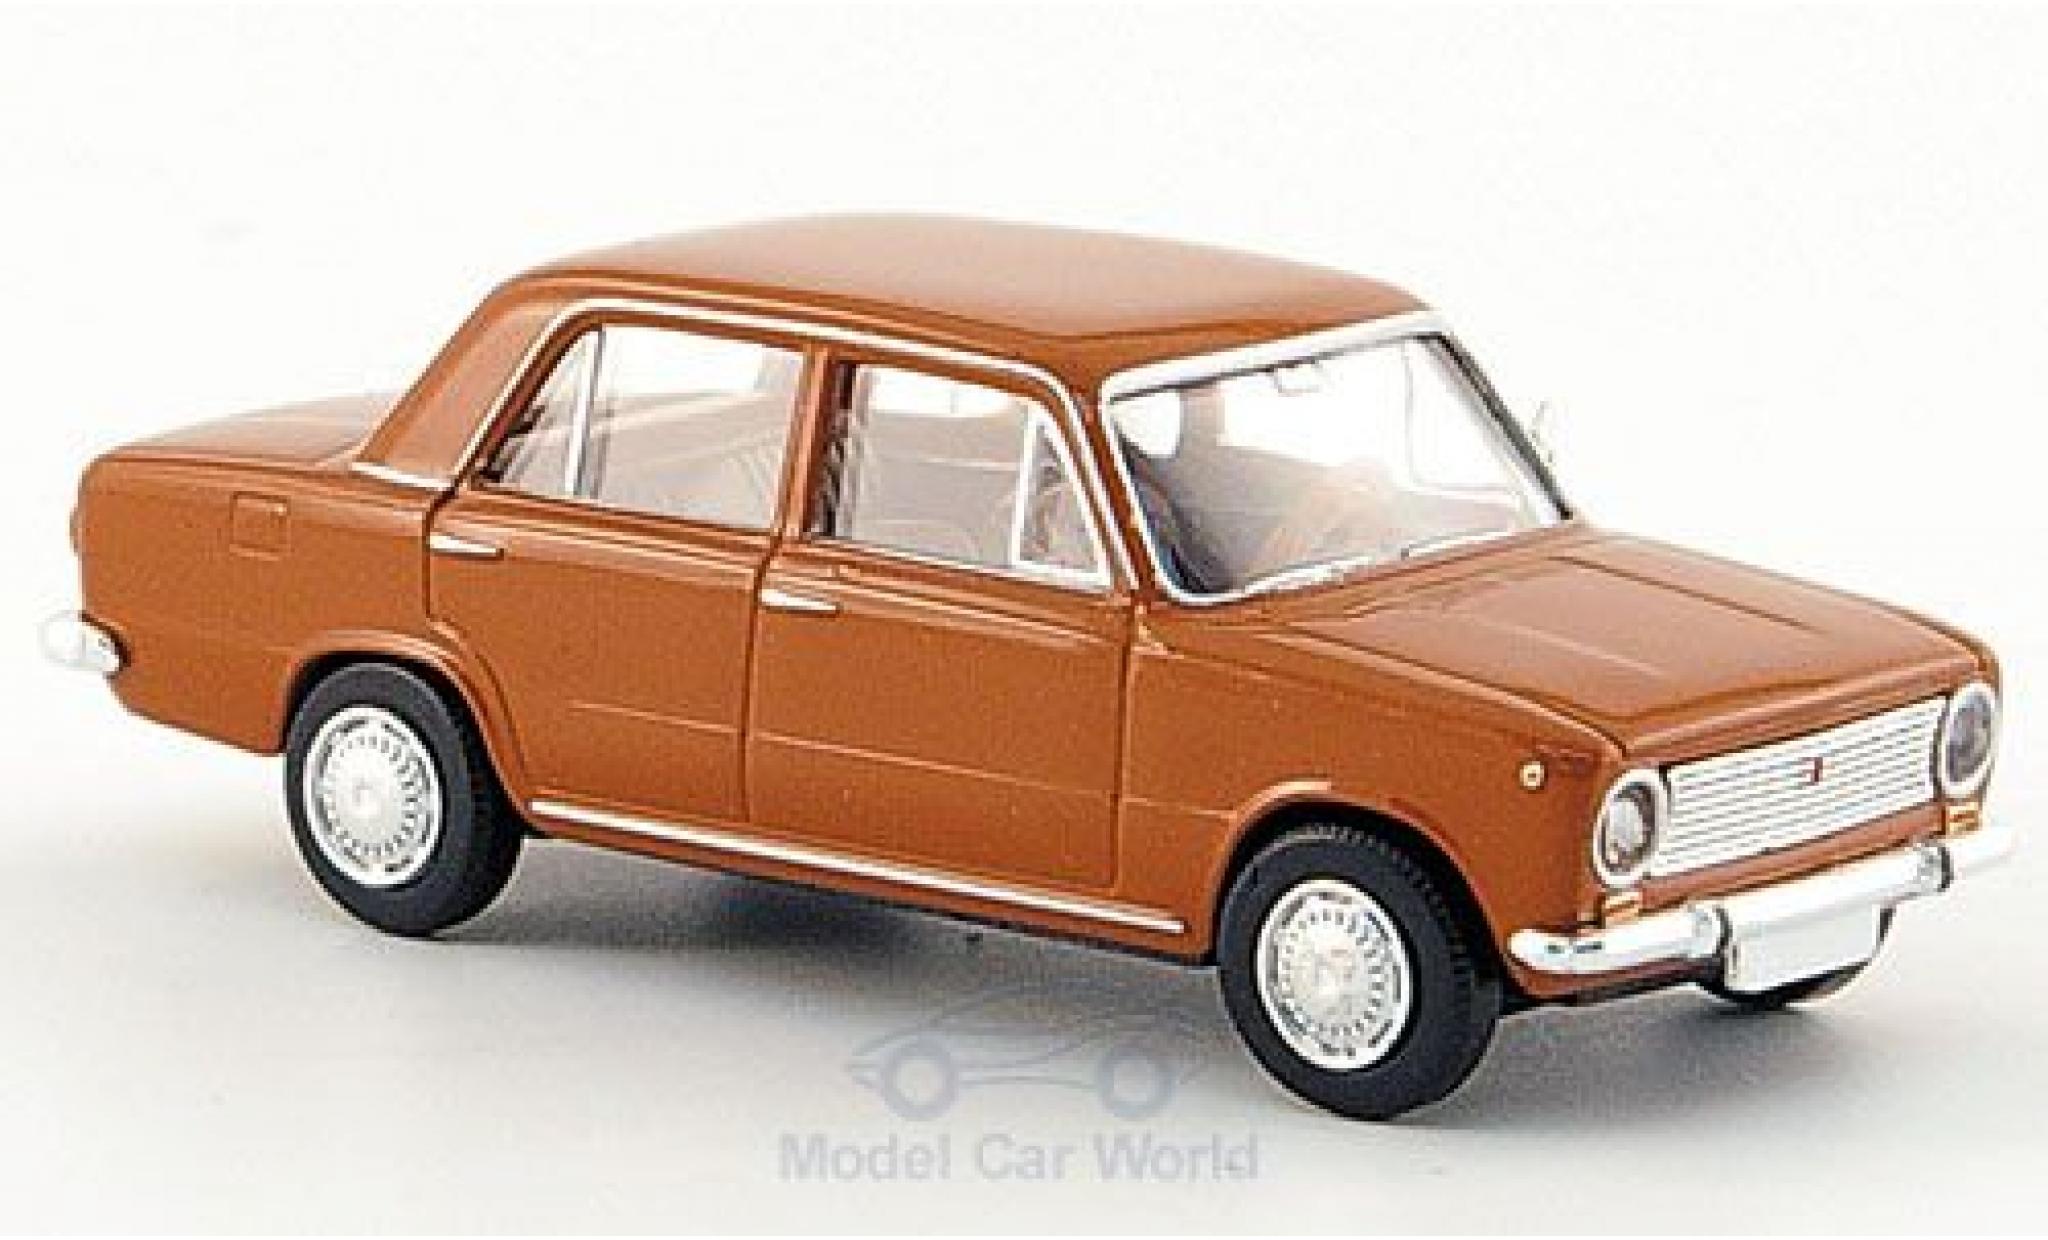 Fiat 124 1/87 Brekina Limousine brown